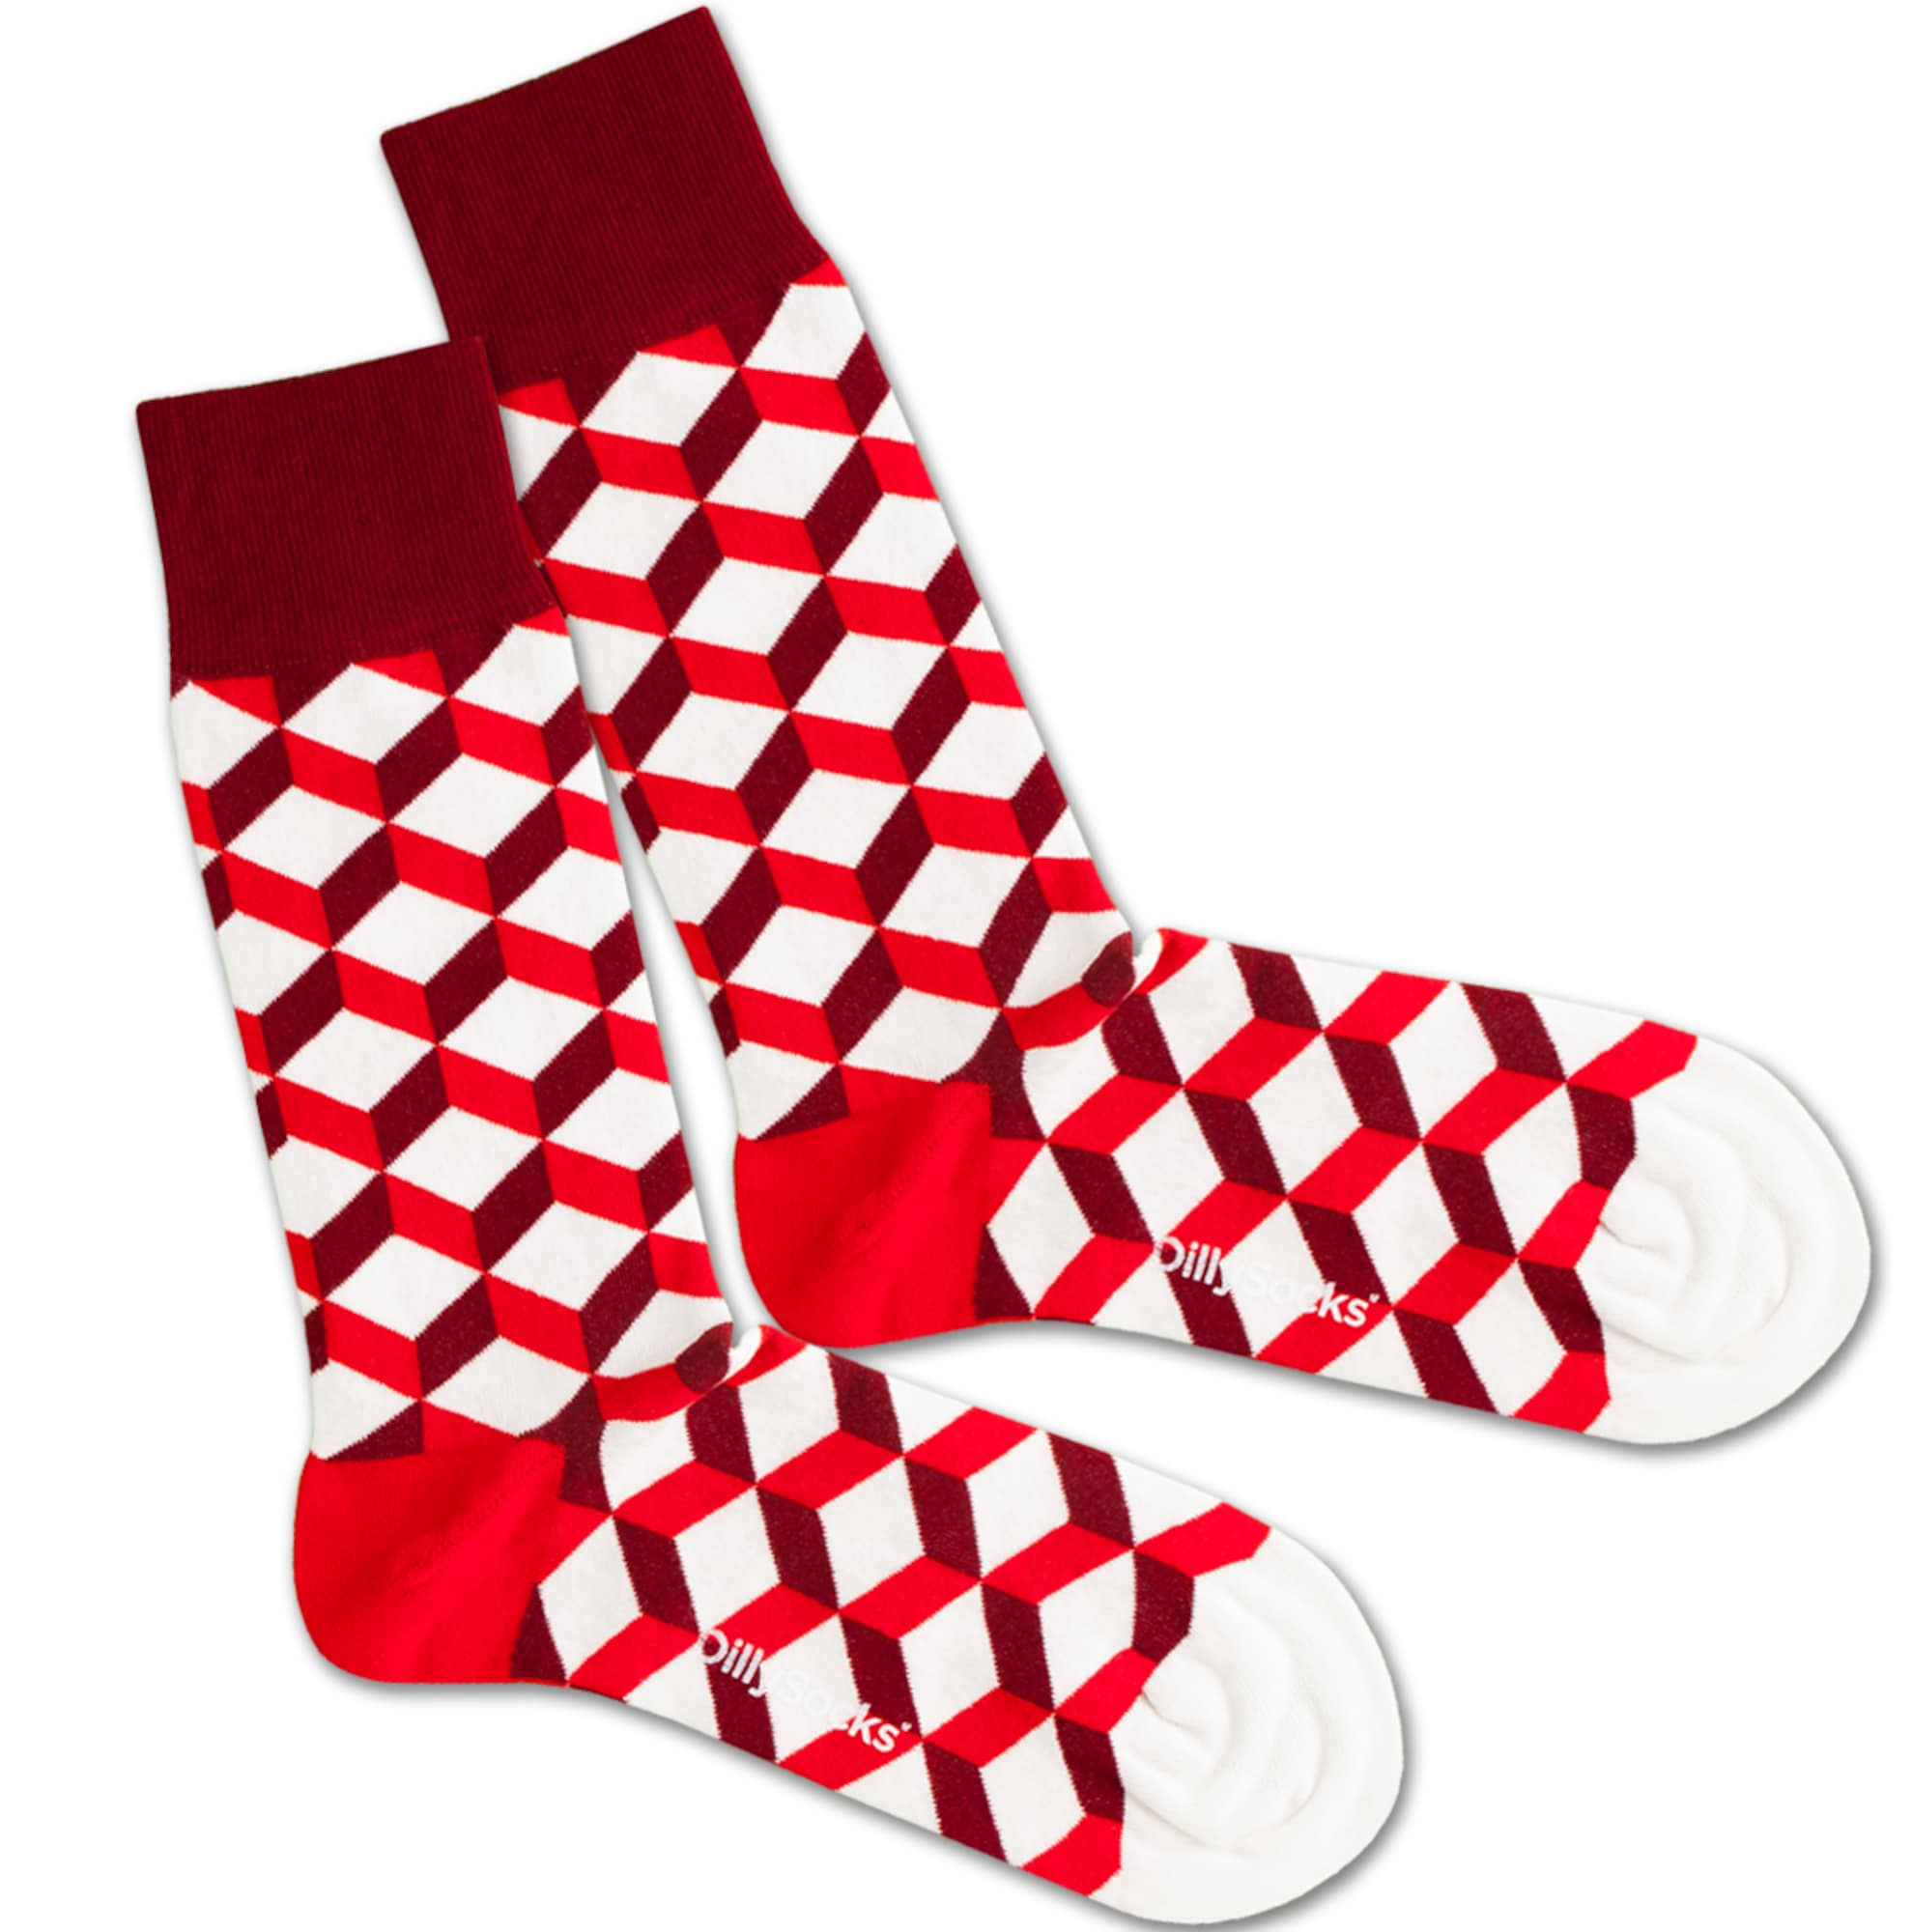 Ponožky Big Bloody Dice červená bílá DillySocks